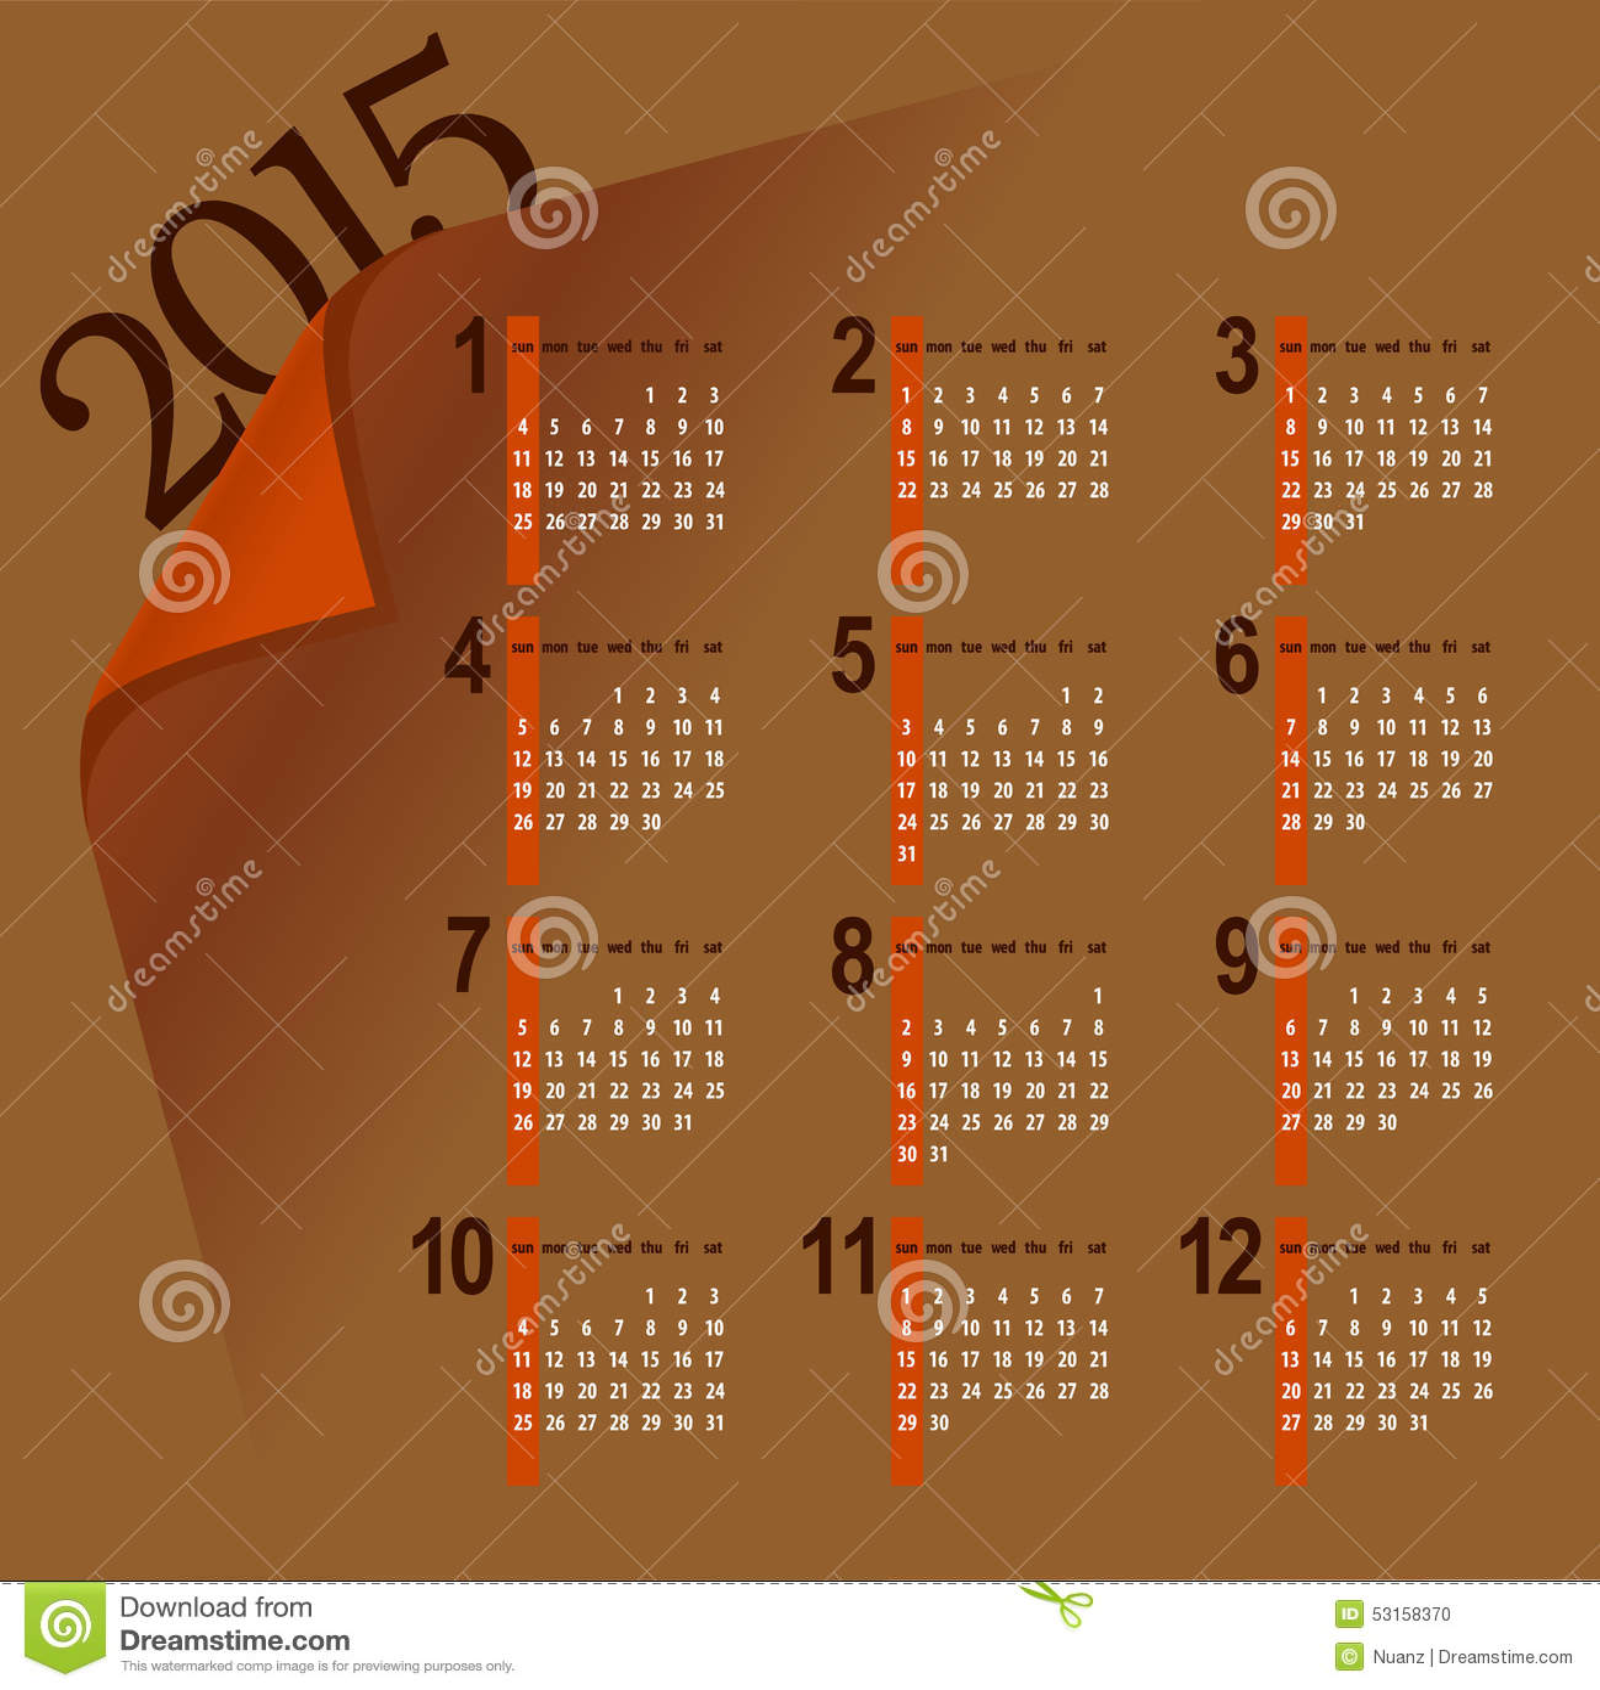 Minimalistic Calendar Design : Minimalistic calendar stock vector image